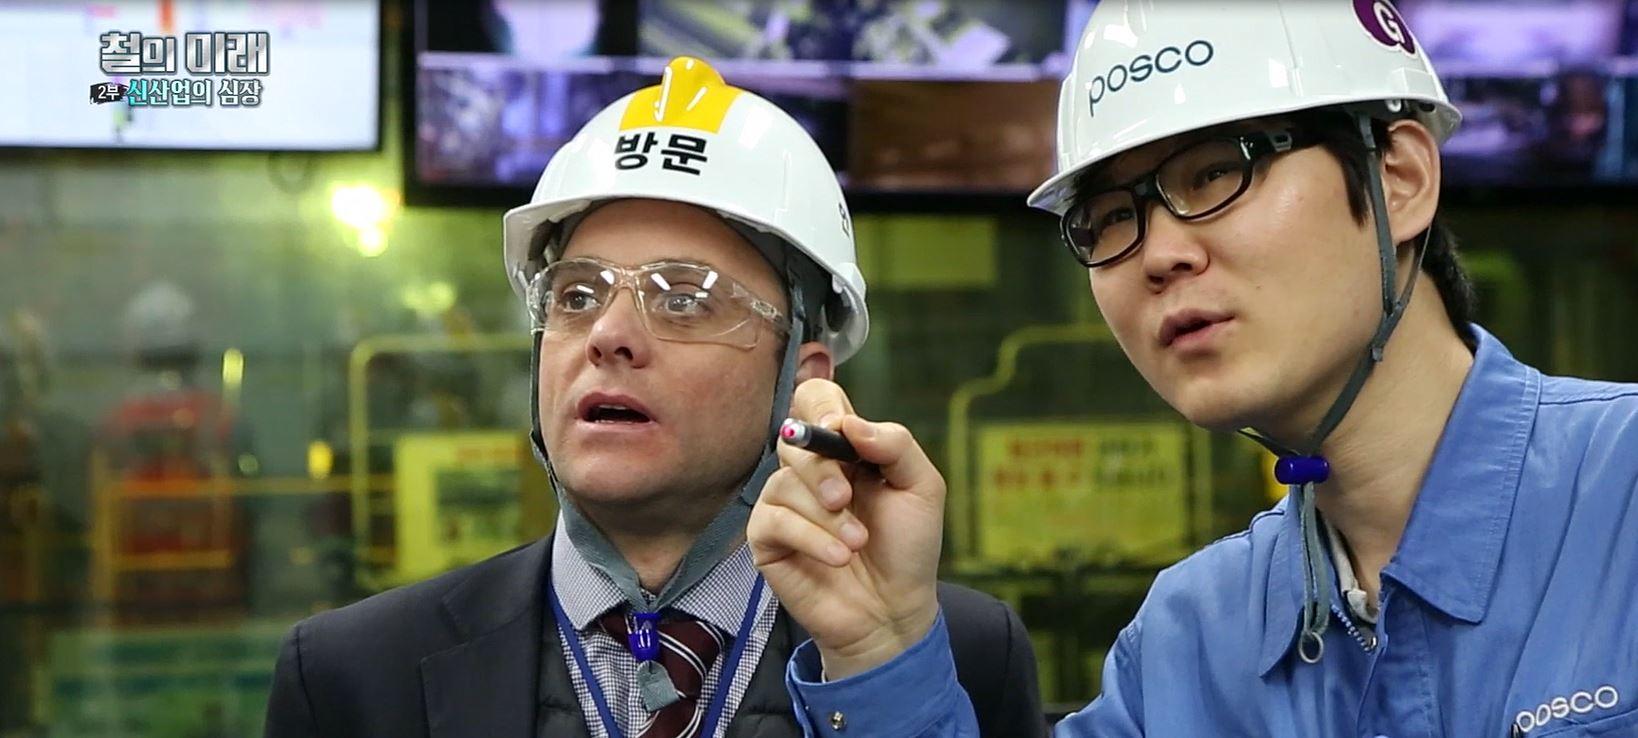 KBS는 '미래기획 2030'을 통해 철이 가진 진정한 가치를 밝히고 철이 가져올 신사업과 미래 비전을 살펴보는 <철의 미래>편 철의 미래 2부 신산업의 심장 방문 posco